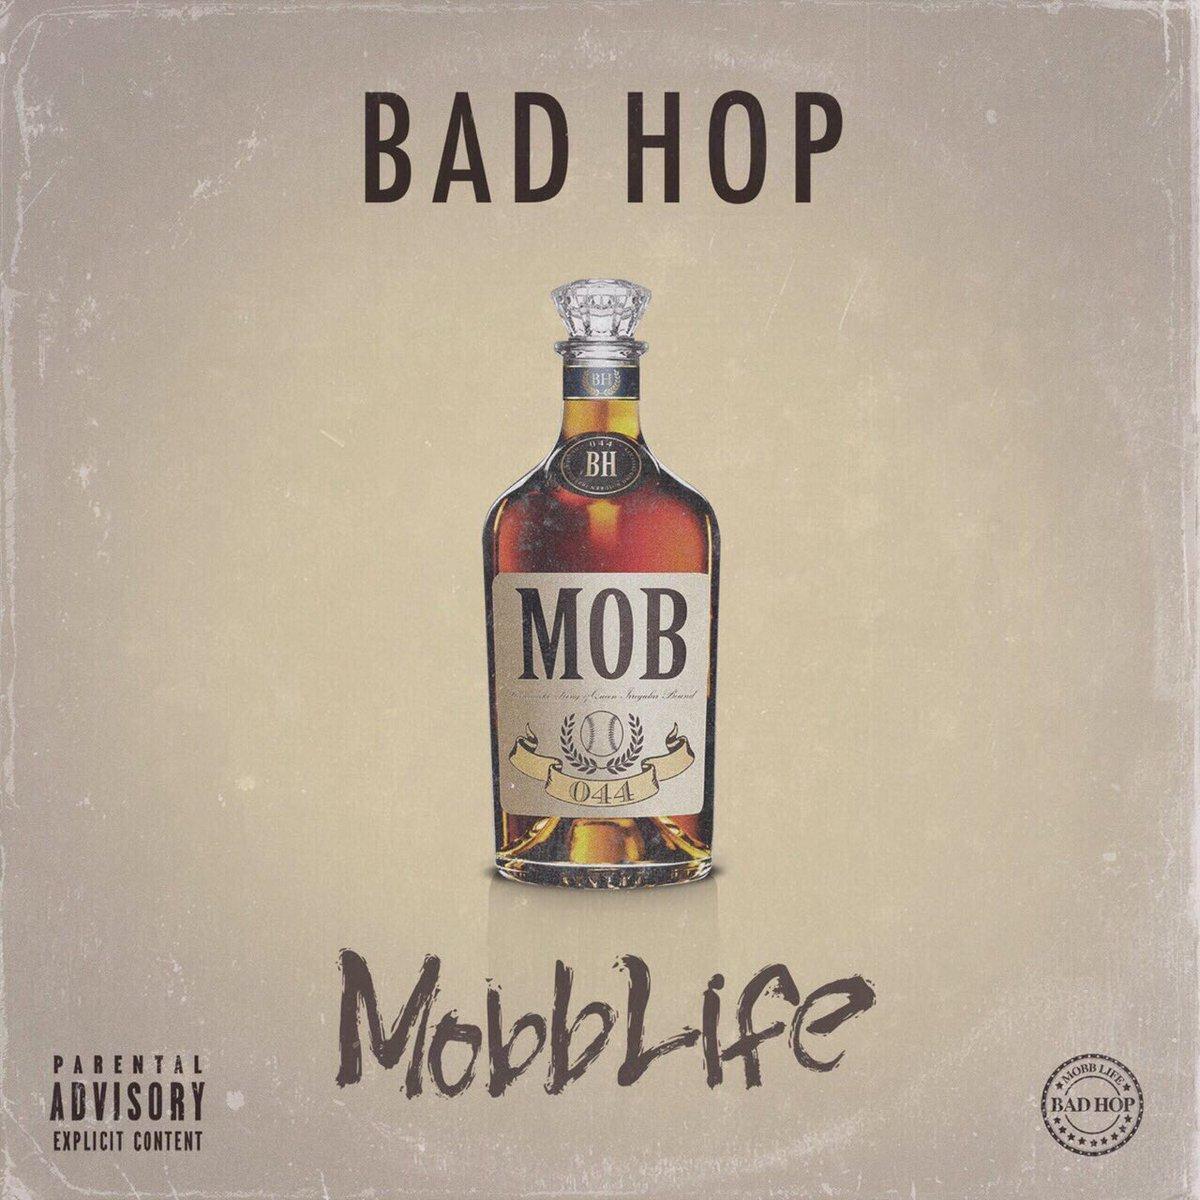 🚨New Audio公開🚨  BAD HOP New Album 「Mobb Life」から  「口だけ - YZERR & Benjazzy」  Official AudioがYouTubeにて公開🔥   https://t.co/VGtYq1FcuJ